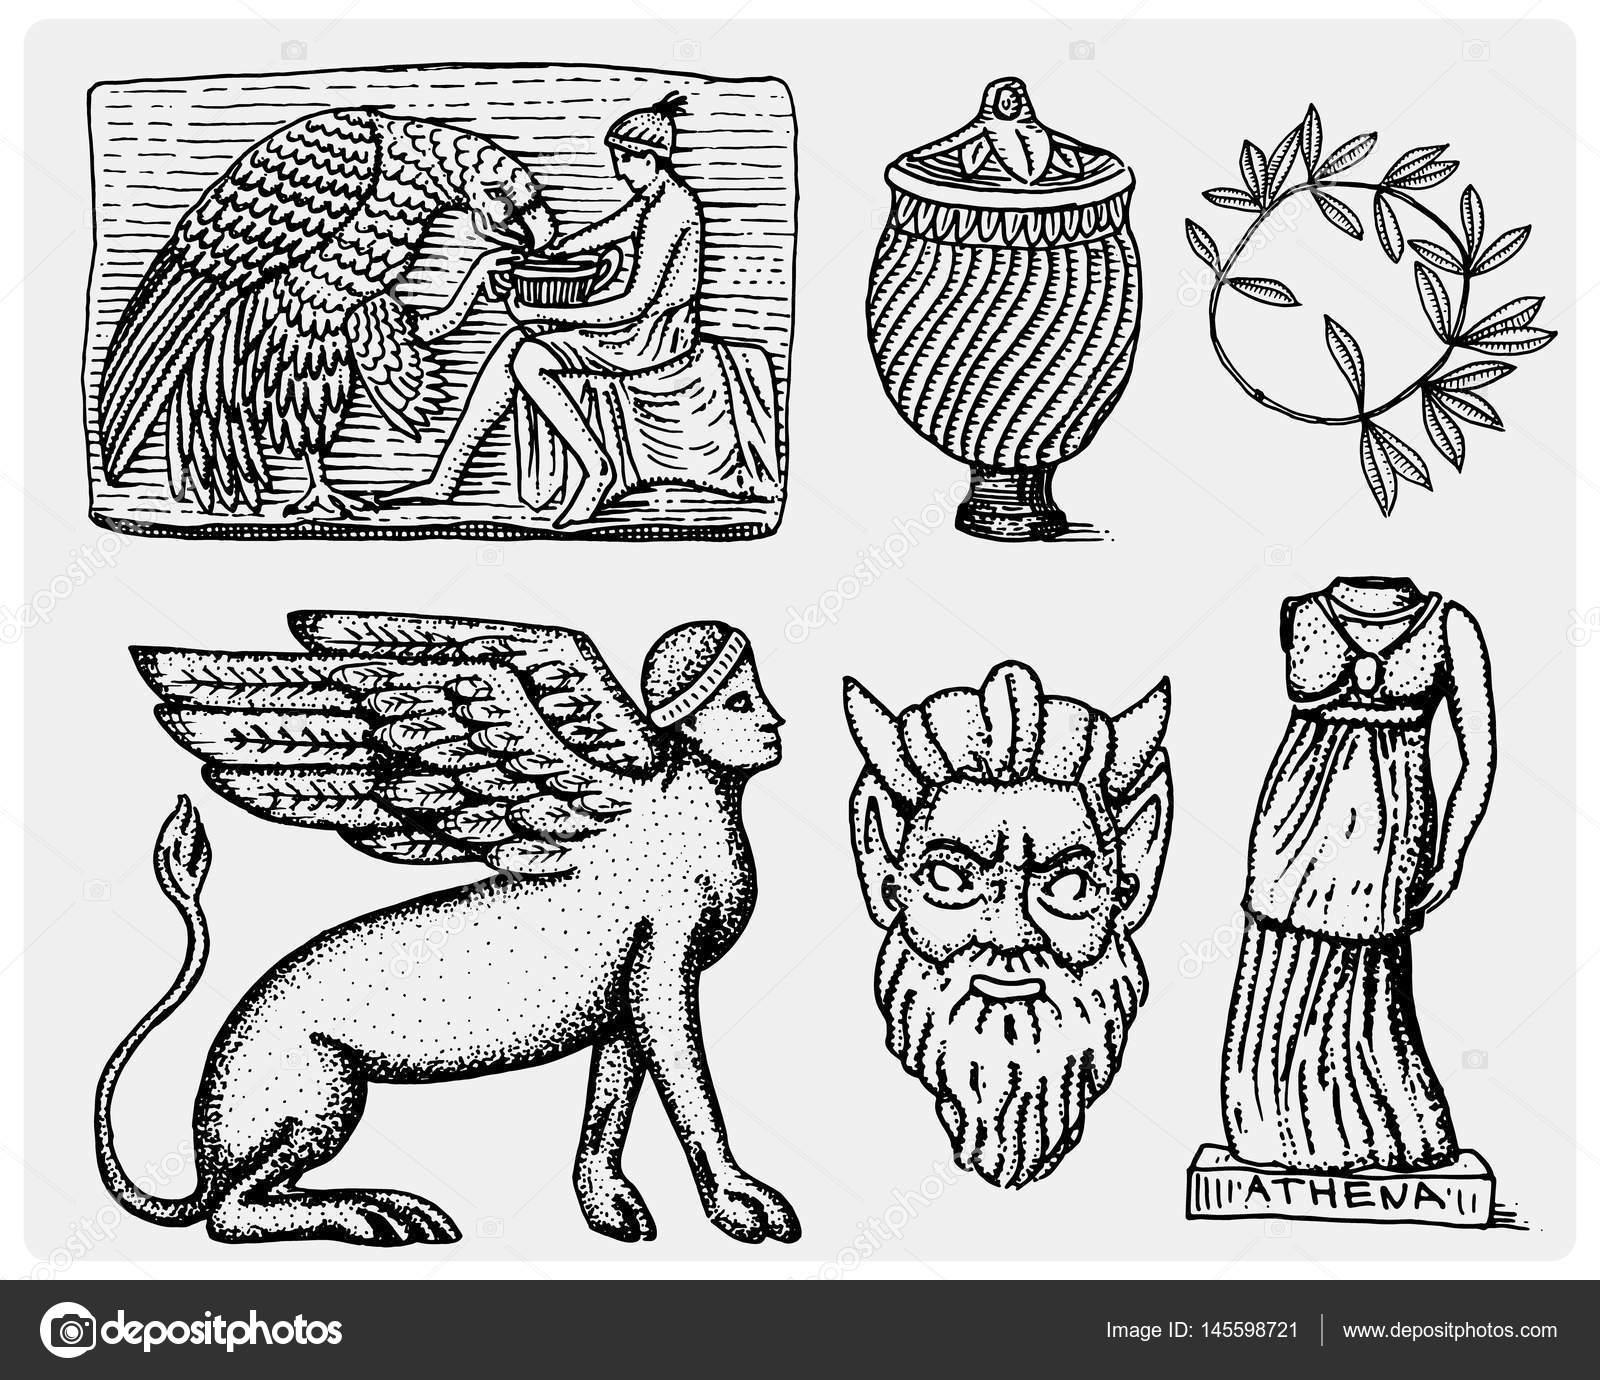 Ancient greece antique symbols ganymede and eagle anphora vase ancient greece antique symbols ganymede and eagle anphora vase athena statue and satyr biocorpaavc